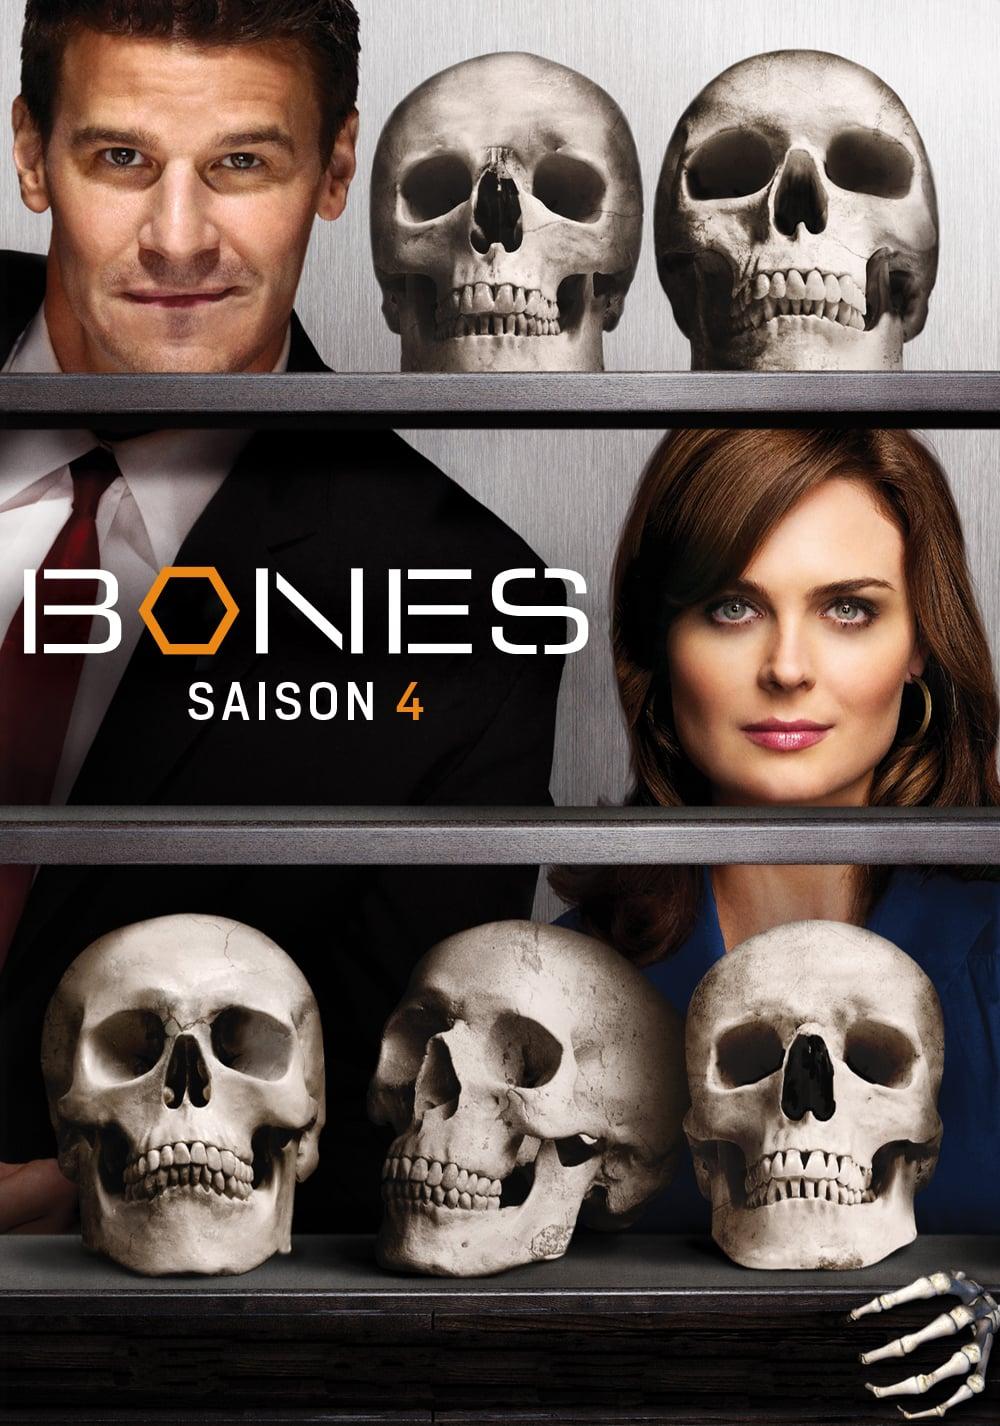 Image code-black-37496-episode-8-season-1.jpg